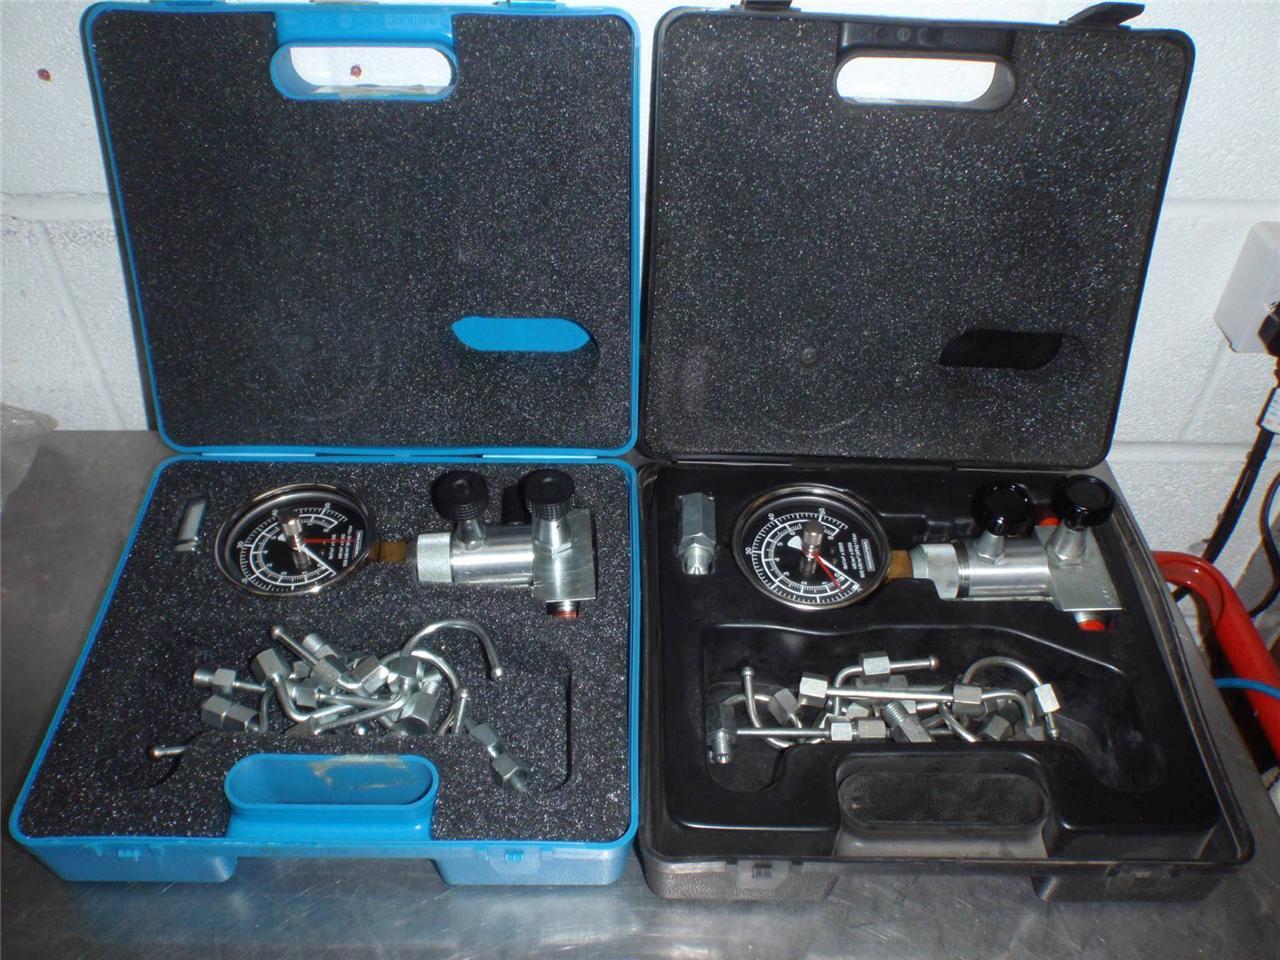 otc diesel injecteur testeur 106 106 a injectester ti. Black Bedroom Furniture Sets. Home Design Ideas